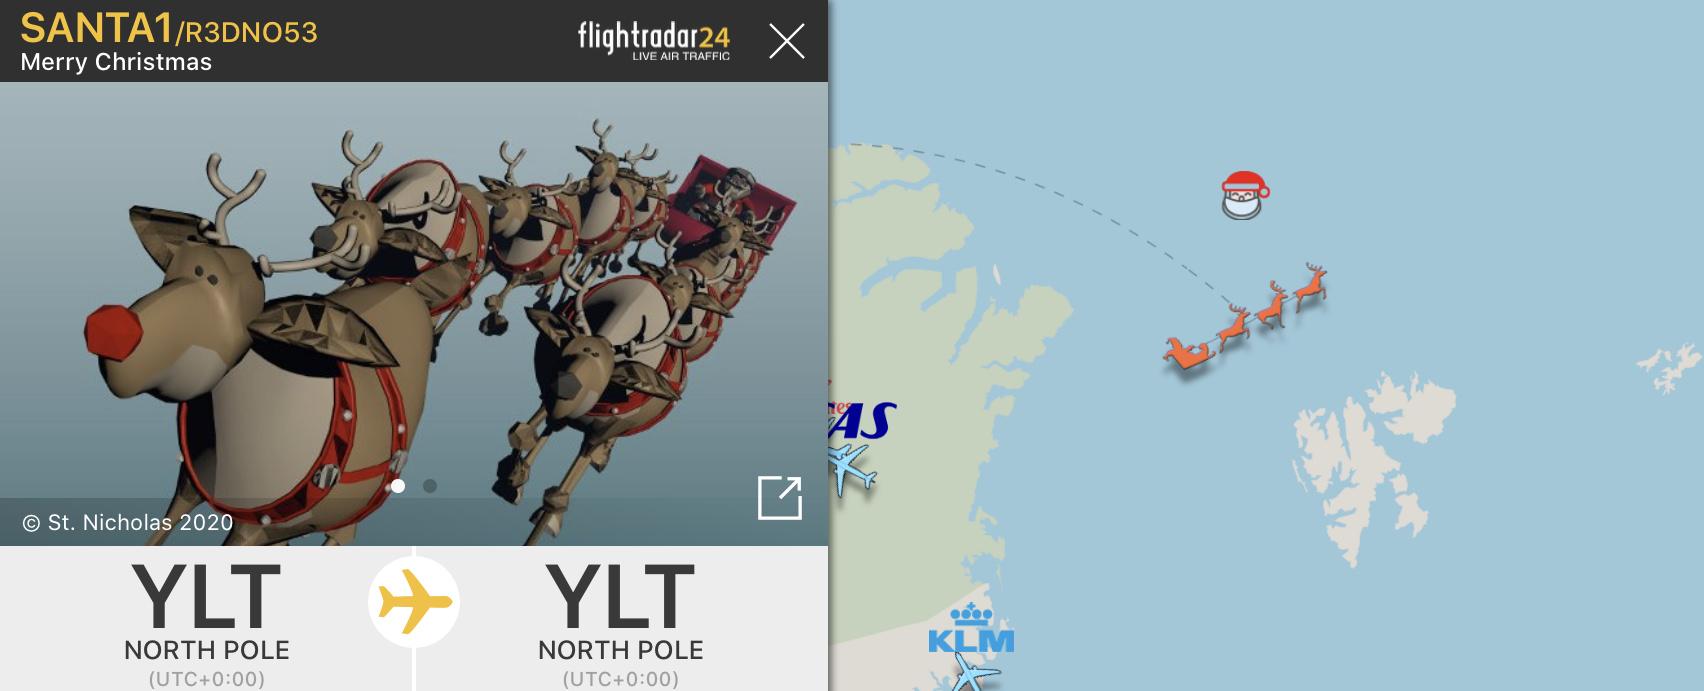 Santa being tracked in the Flightradar24 app